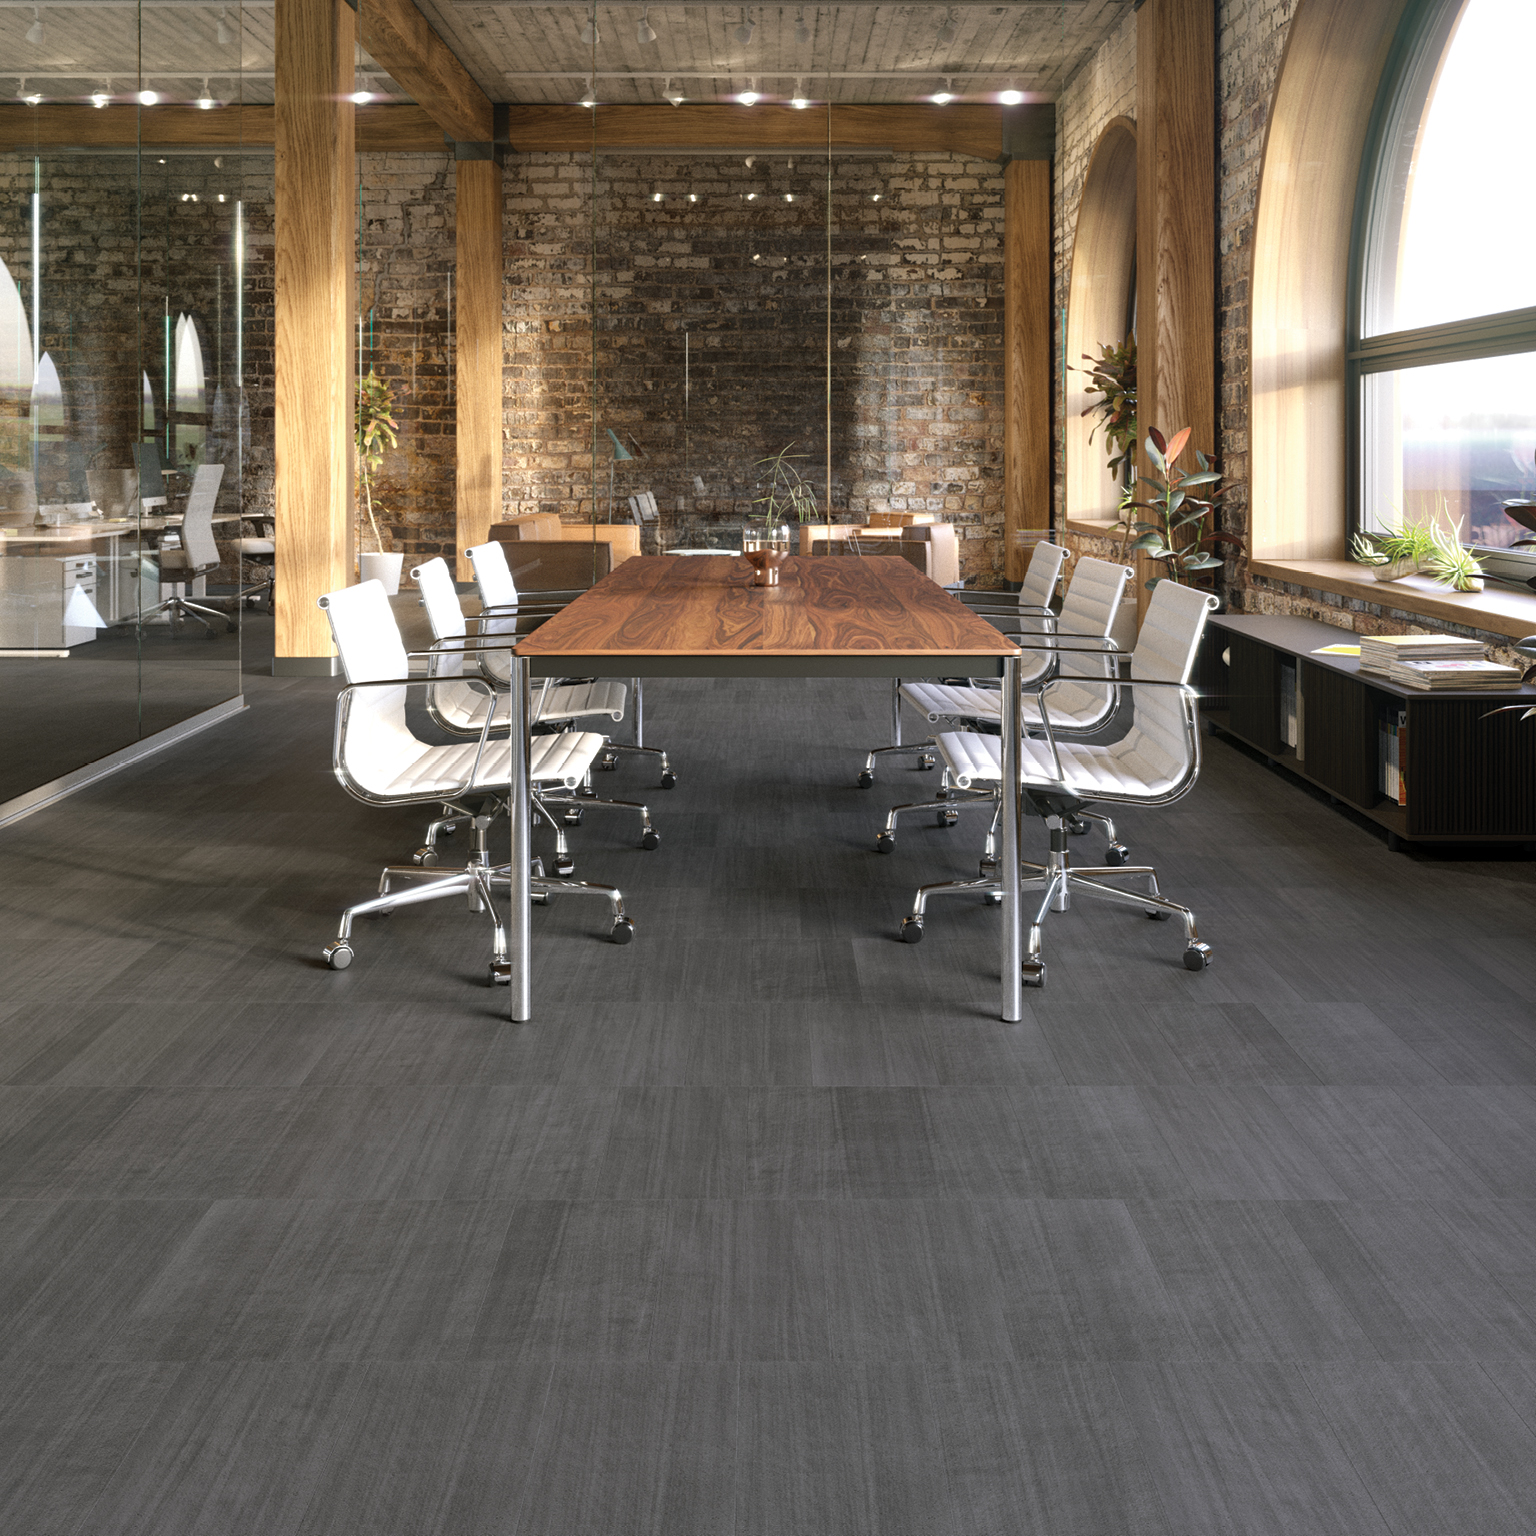 Mannington Select Stone Lvt Hard Surface Mannington Commercial